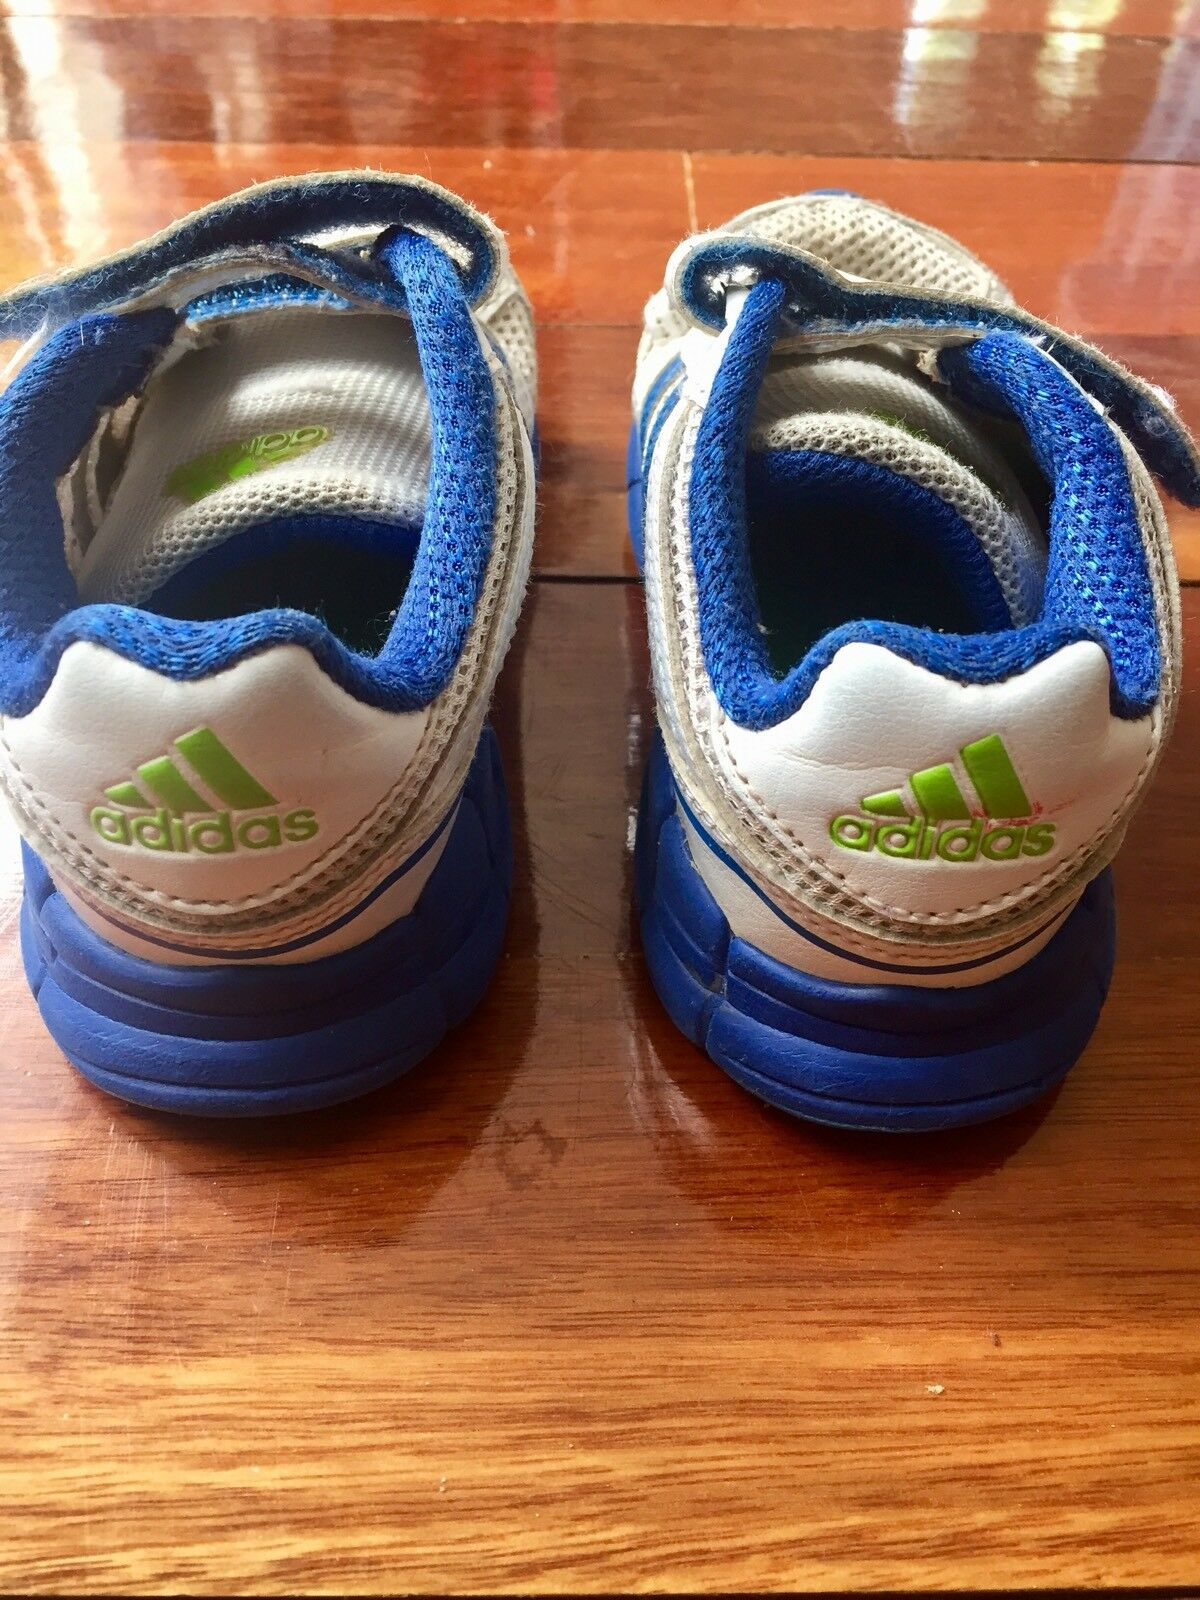 Adidas Kids Boys Shoes cipők.Méret US 8K UK 7.5K